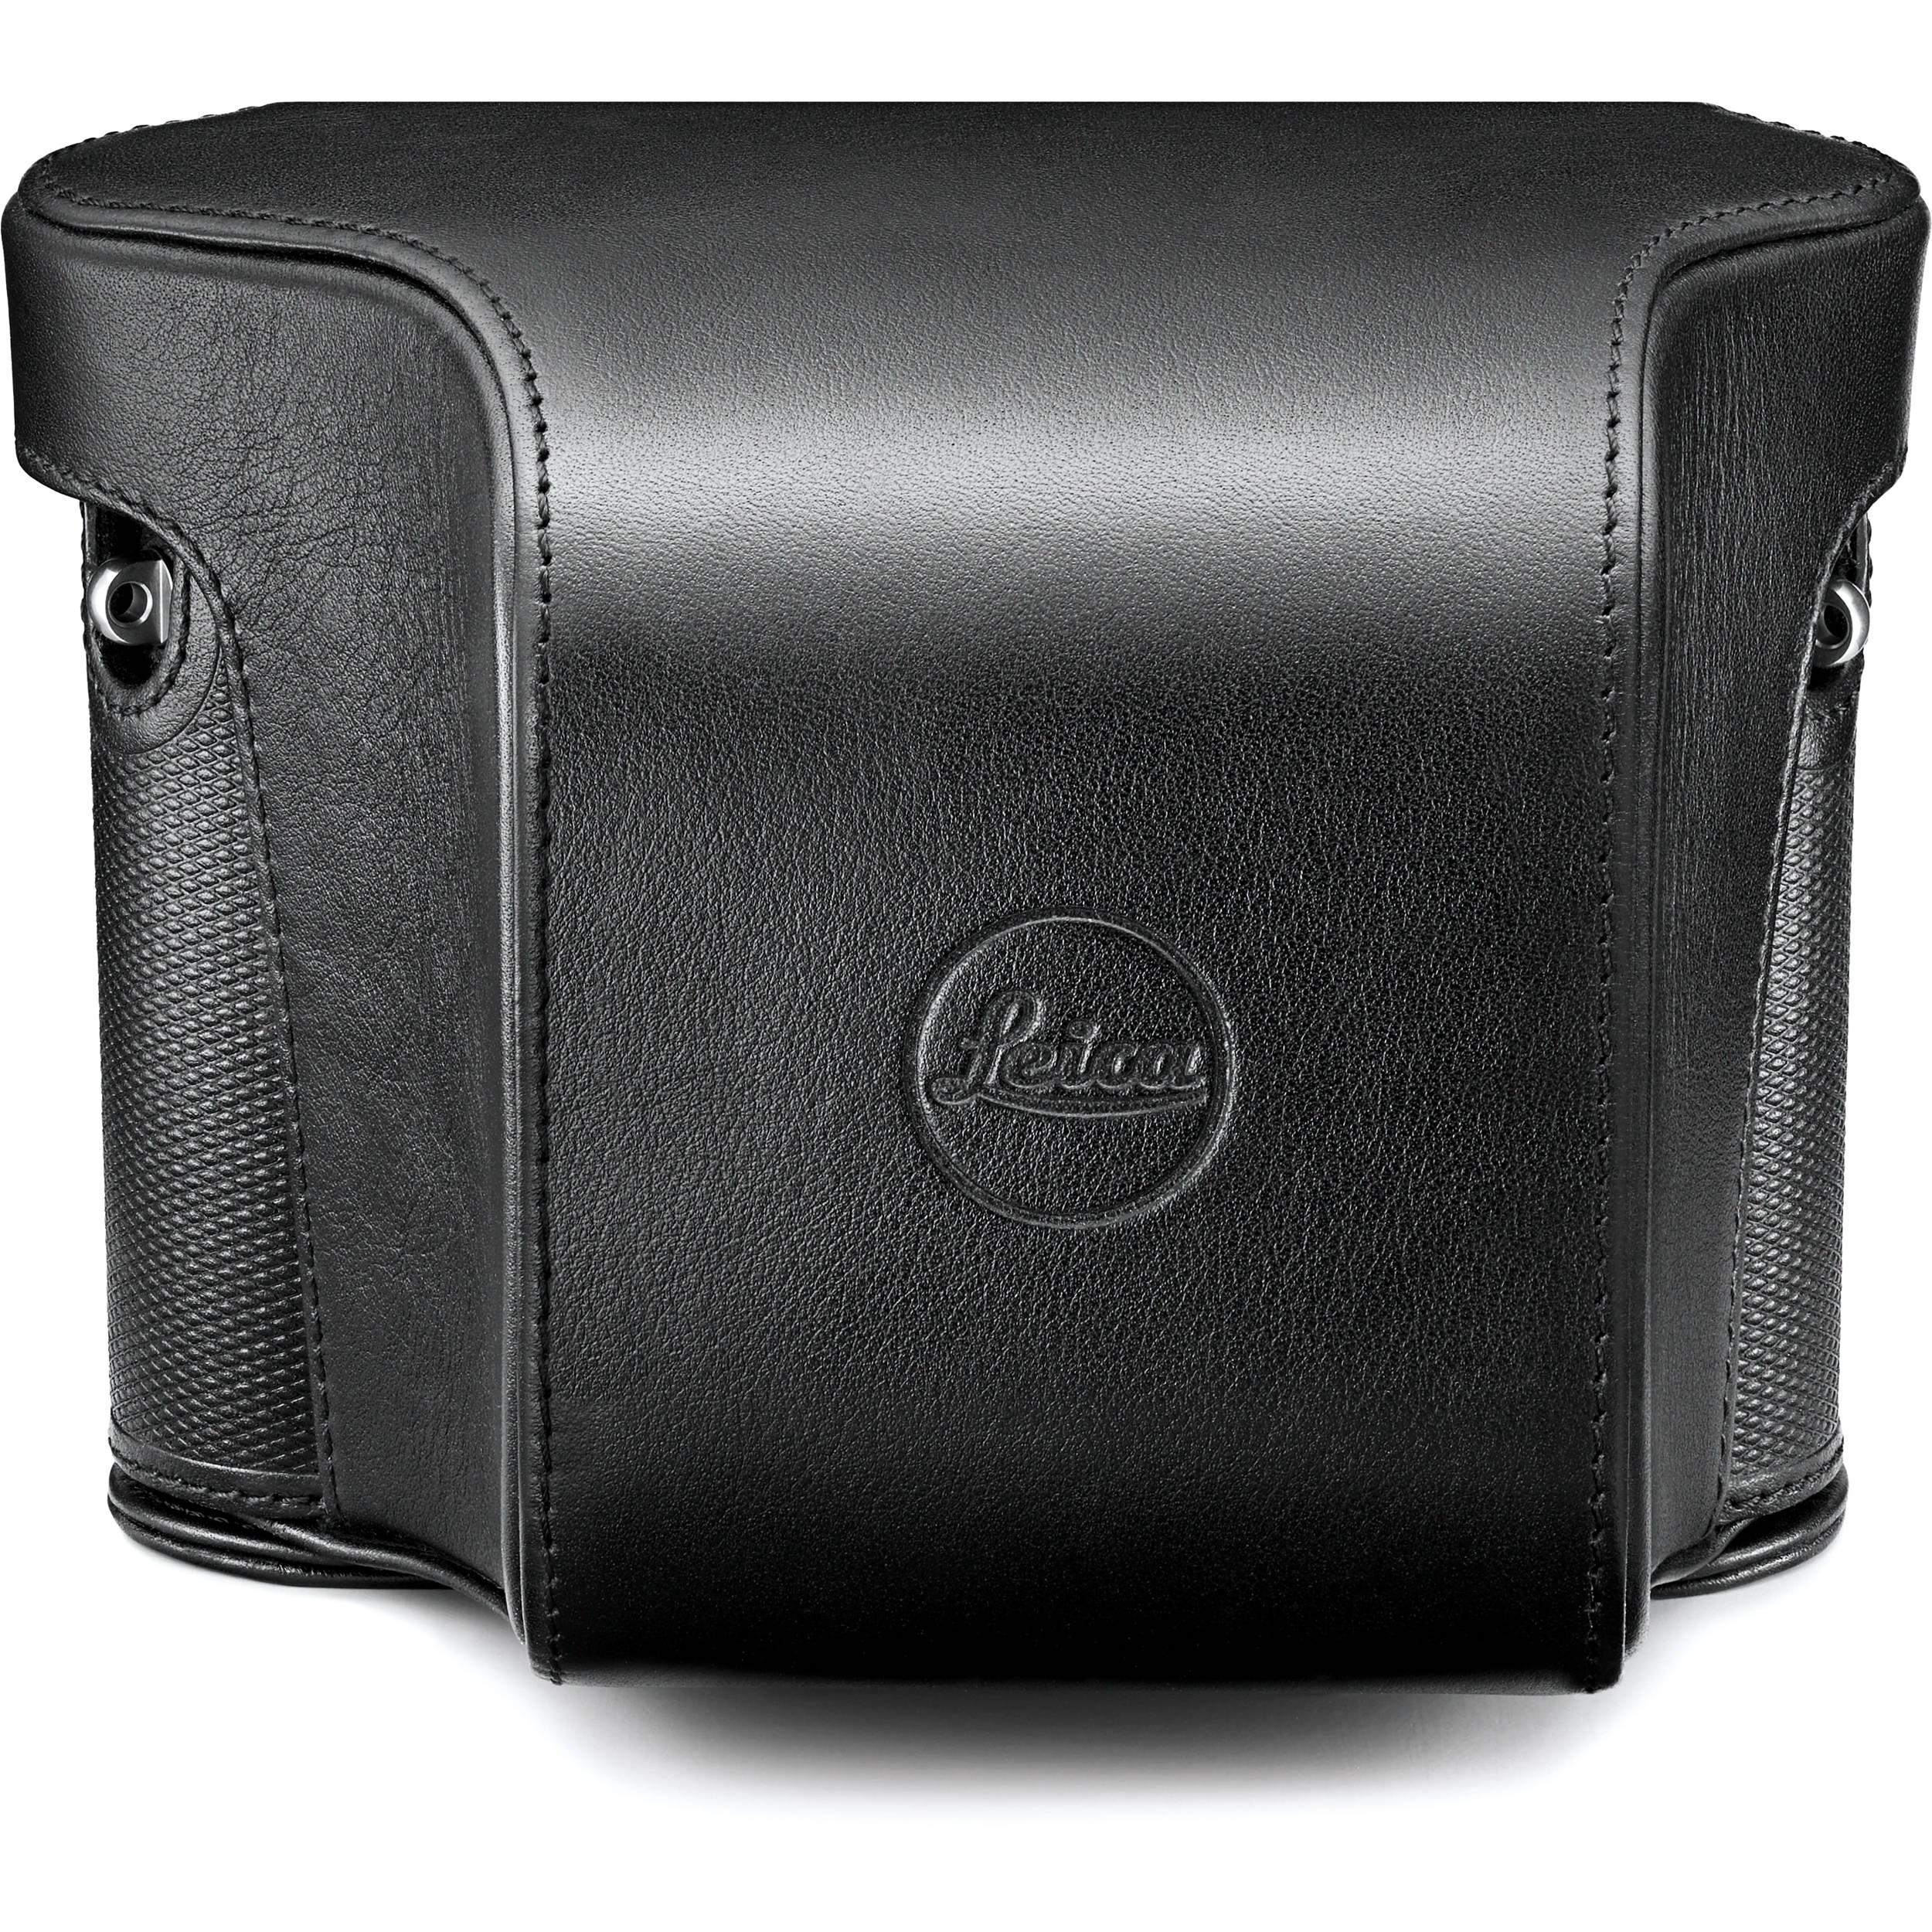 29ccb8556db Leica Q Ever-Ready Case for Q Digital Camera 19502 B&H Photo